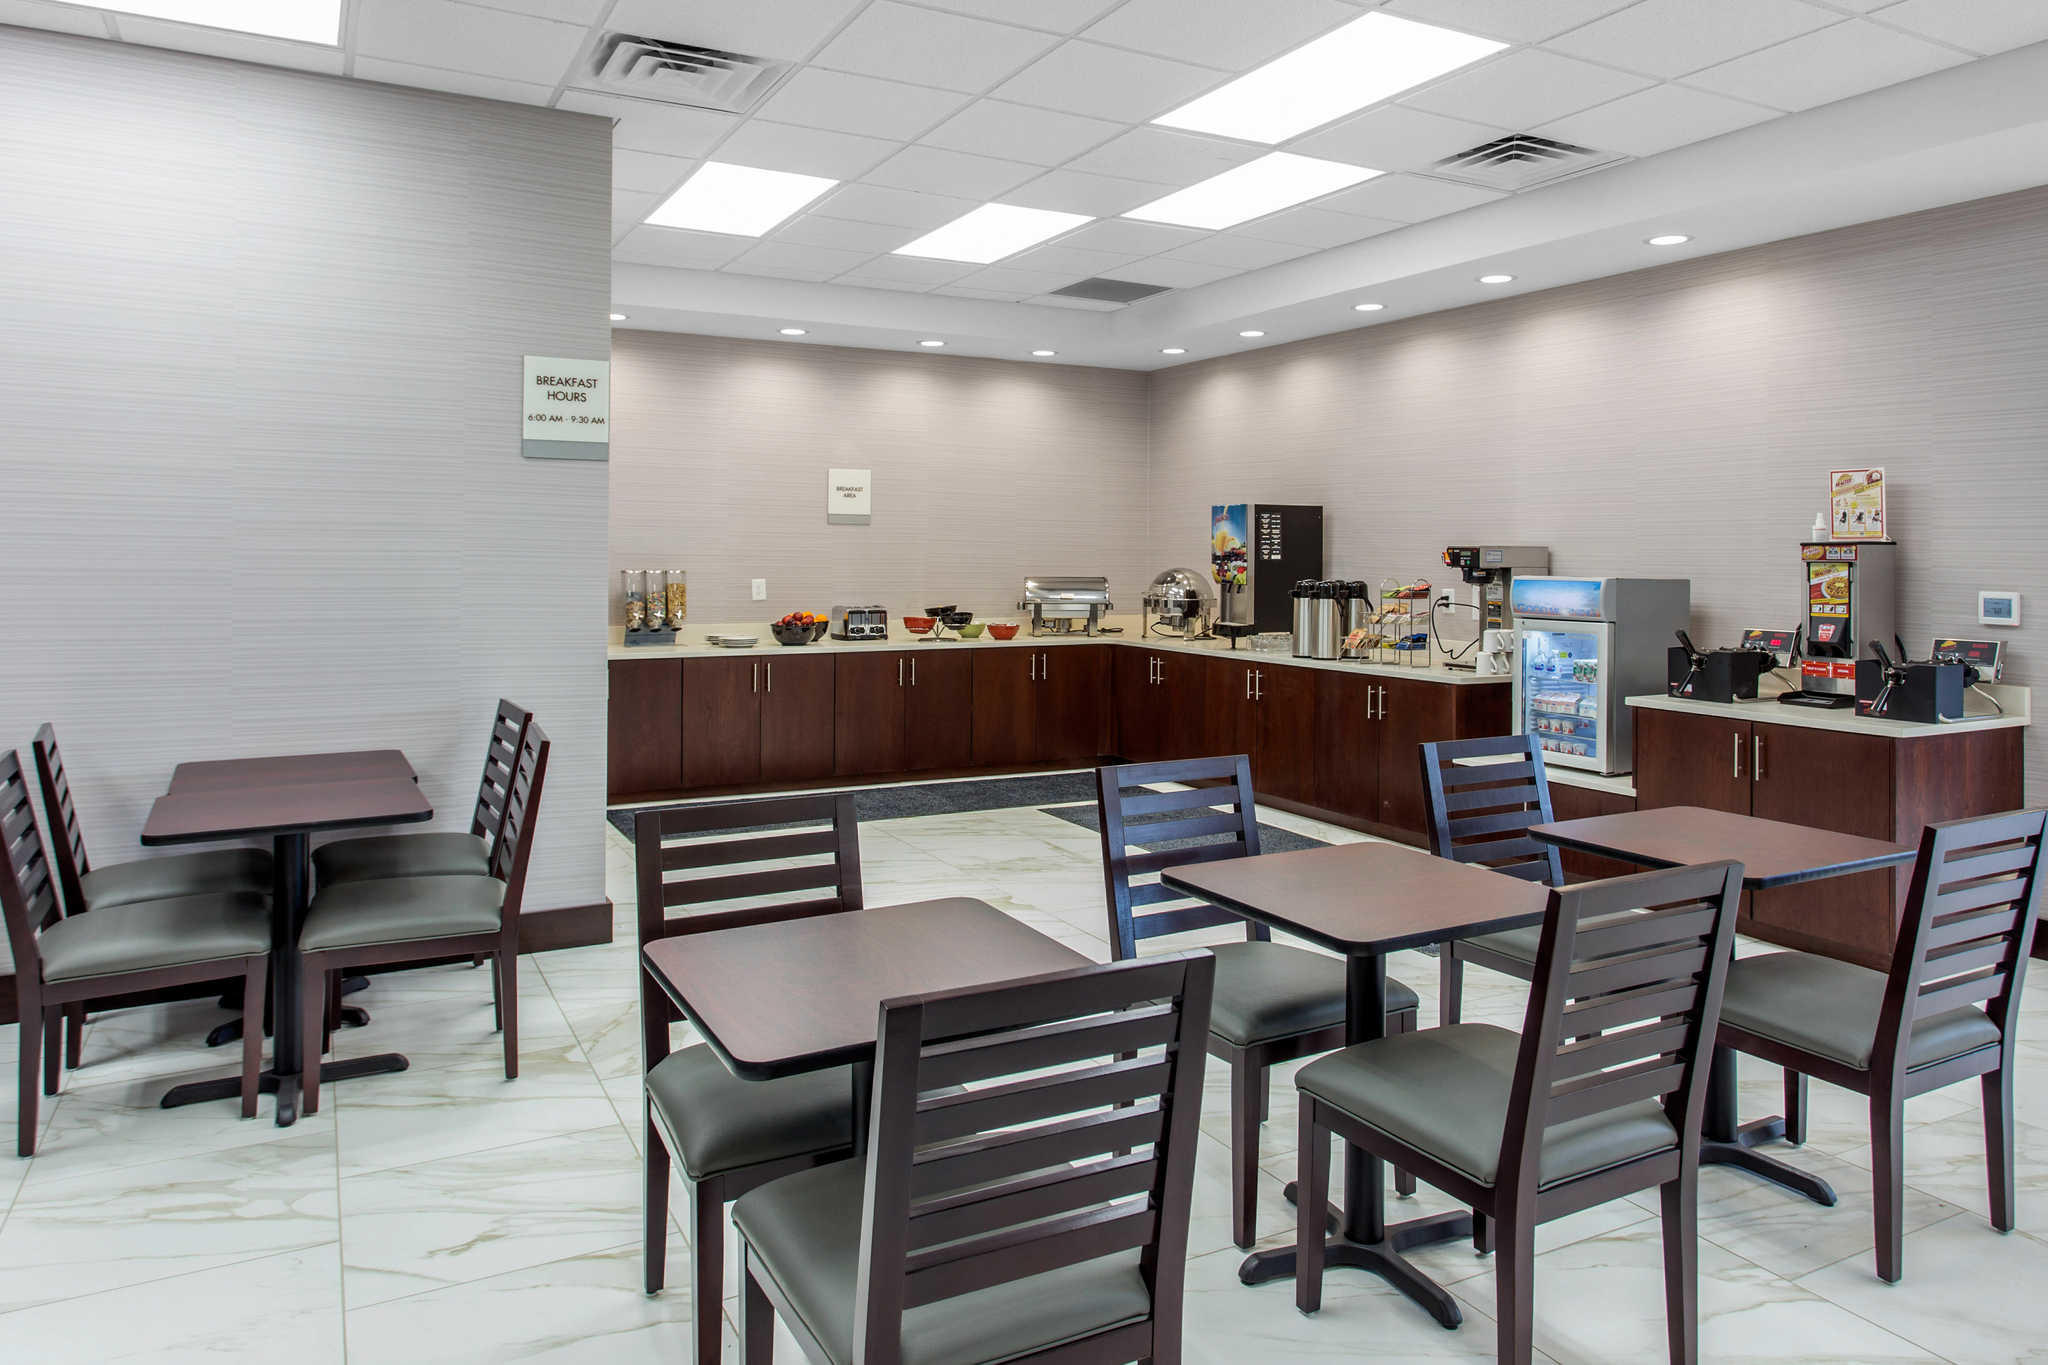 Clarion Inn & Suites image 28